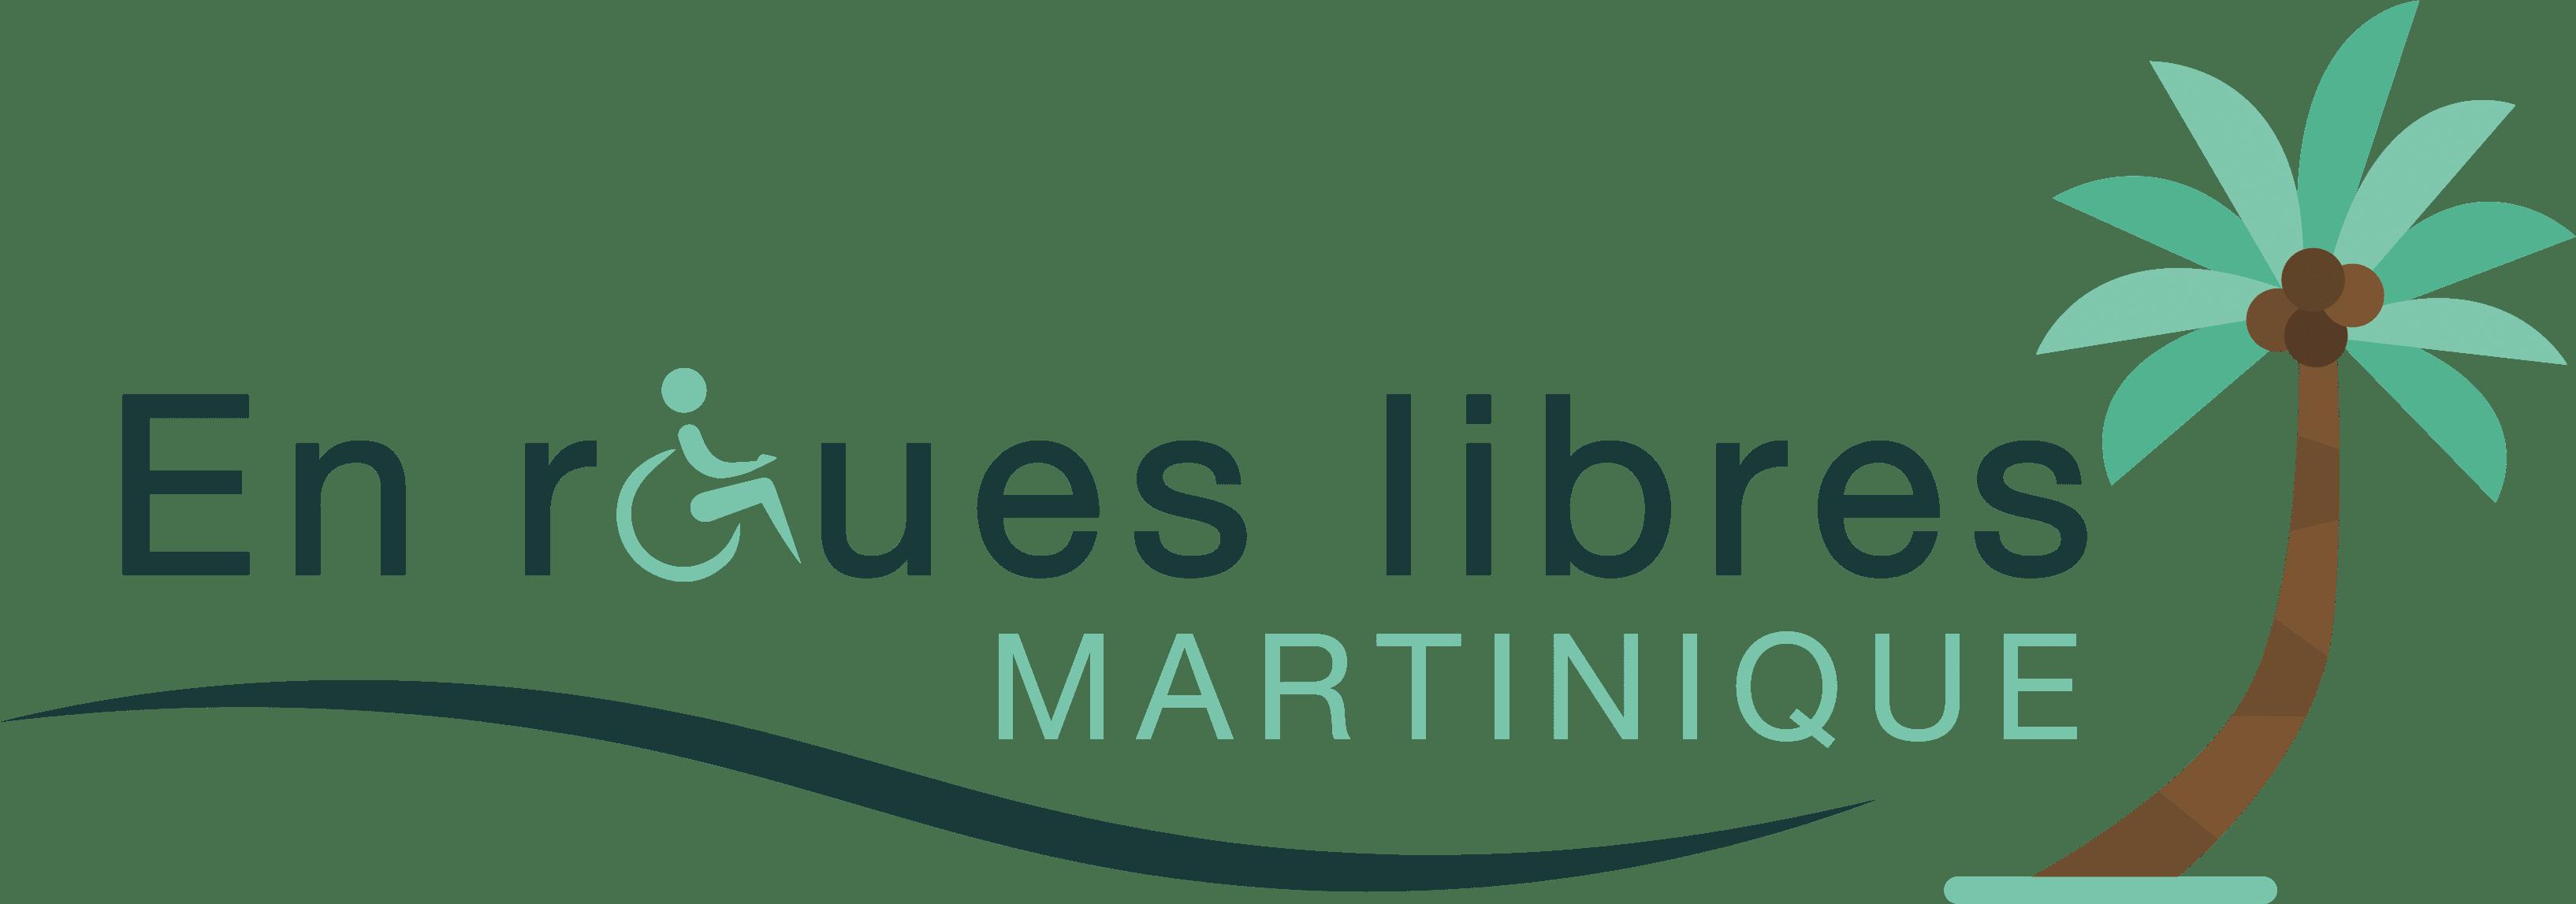 La Martinique en roues libres